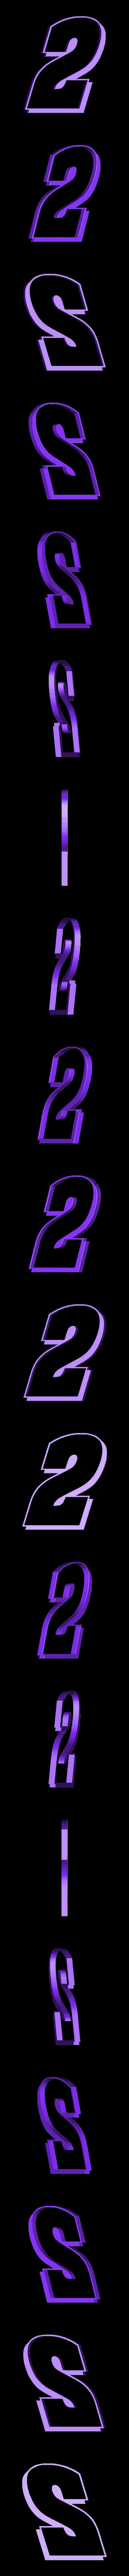 2_Black.stl Download free STL file JEFF GORDON #24 • 3D printer model, GREGCAR_3DPrinting